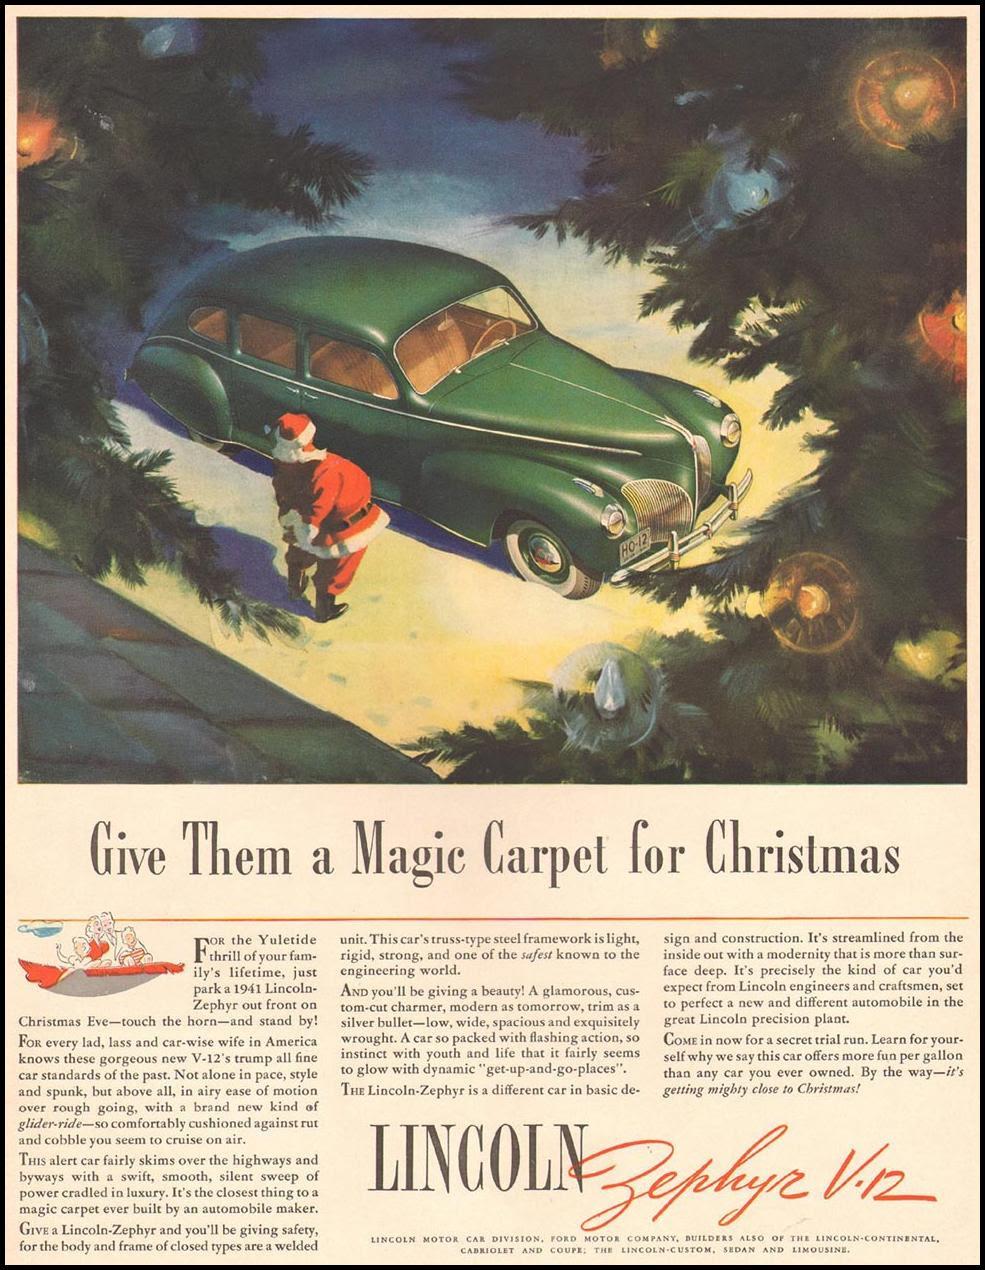 LINCOLN AUTOMOBILES LIFE 12/16/1940 p. 6